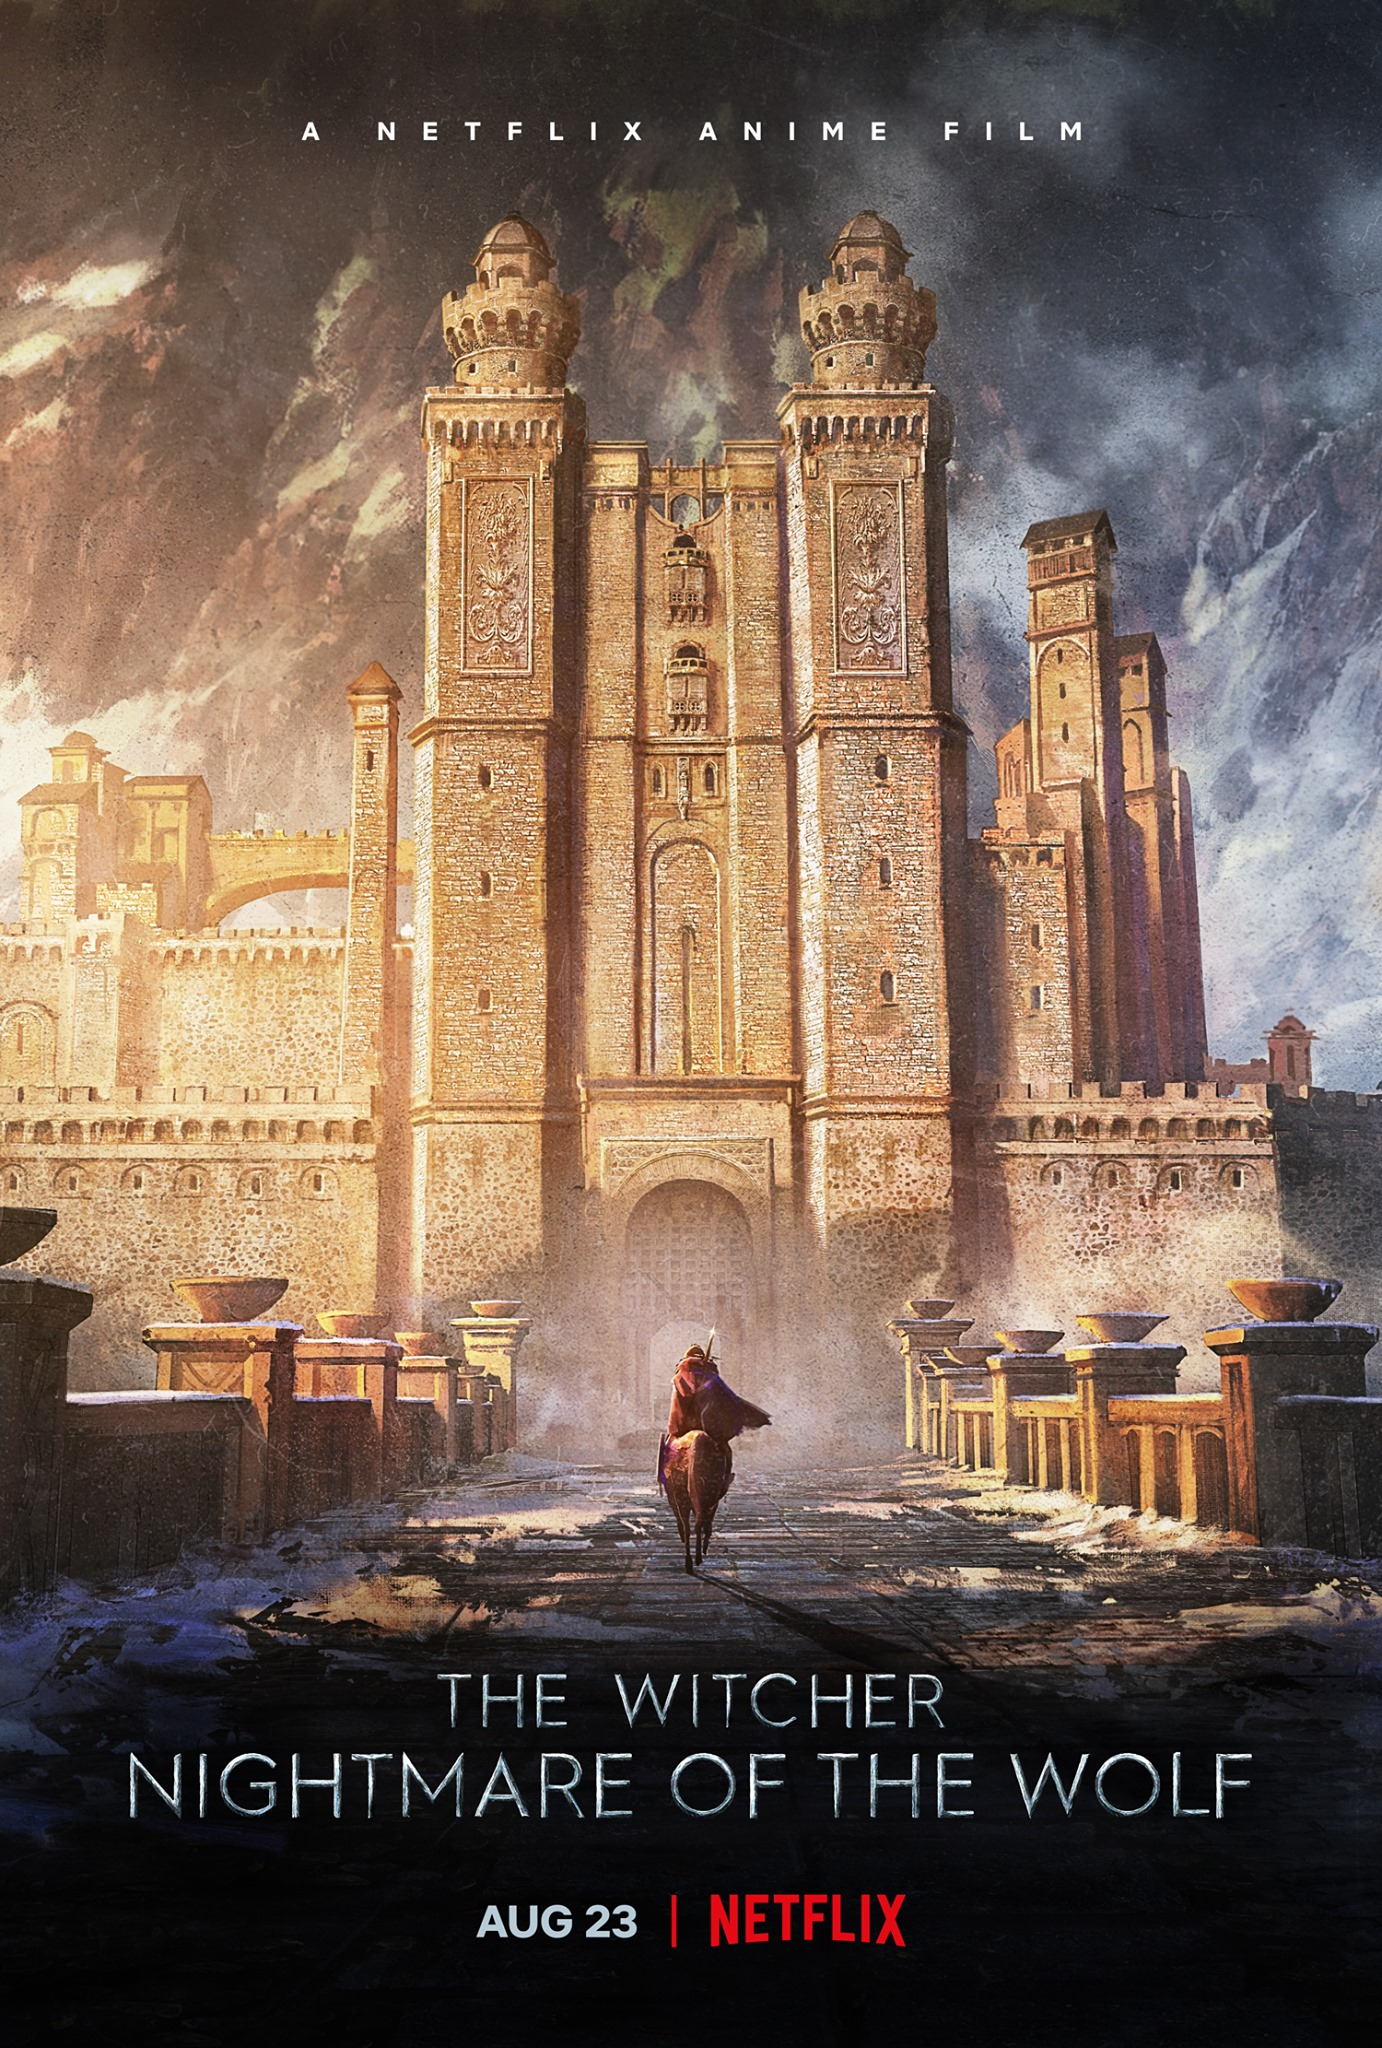 The Witcher: Nightmare of the Wolf: la locandina